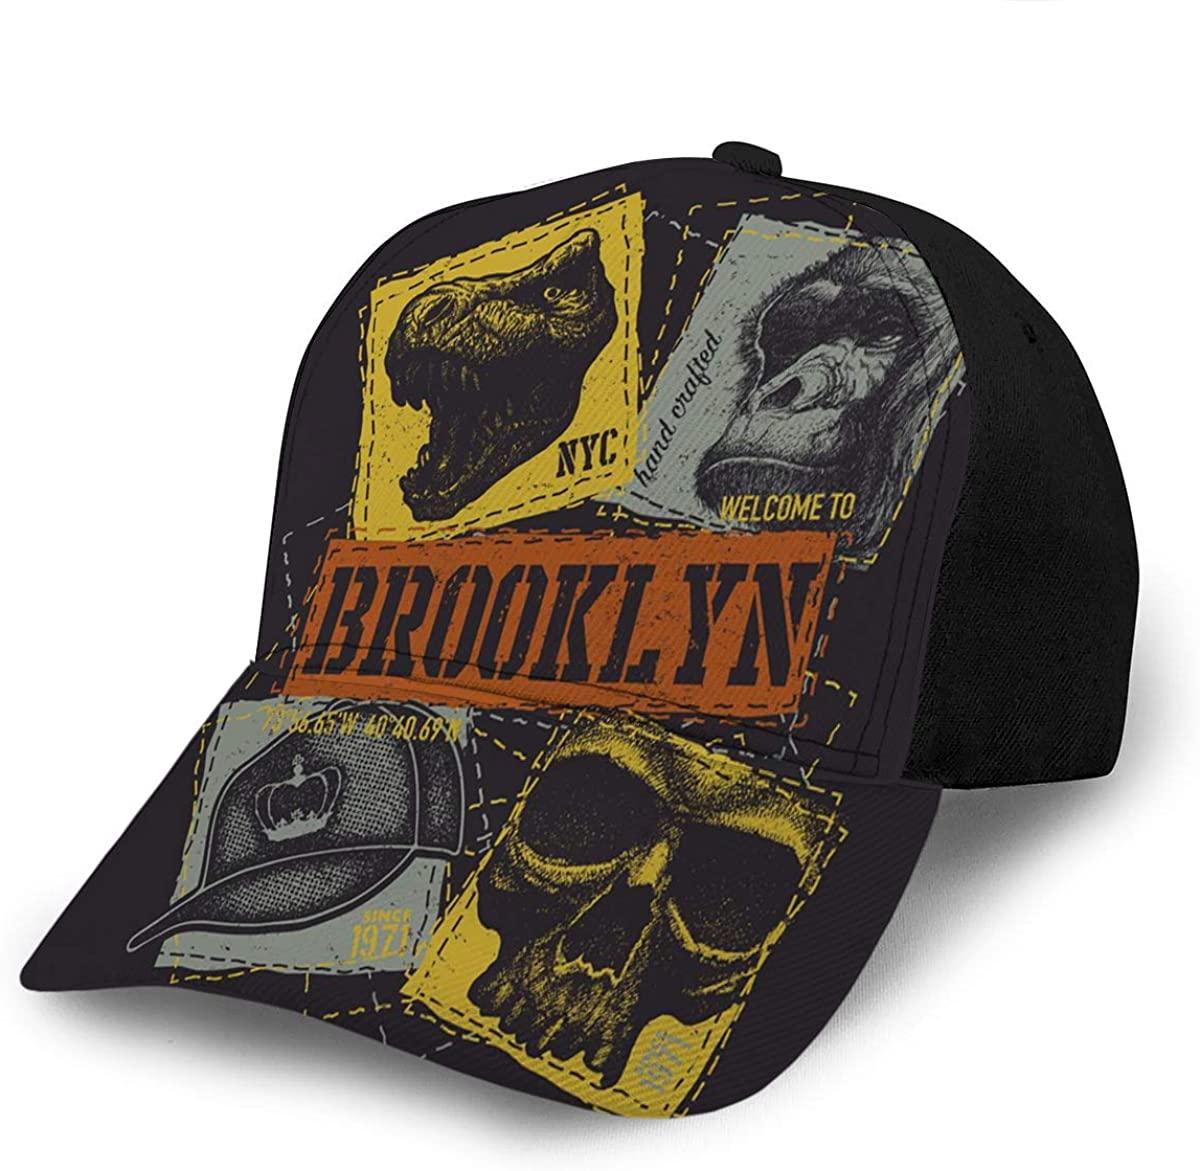 Baseball Hats Caps Vintage Urban Hard Hats Party Chamion Snapback